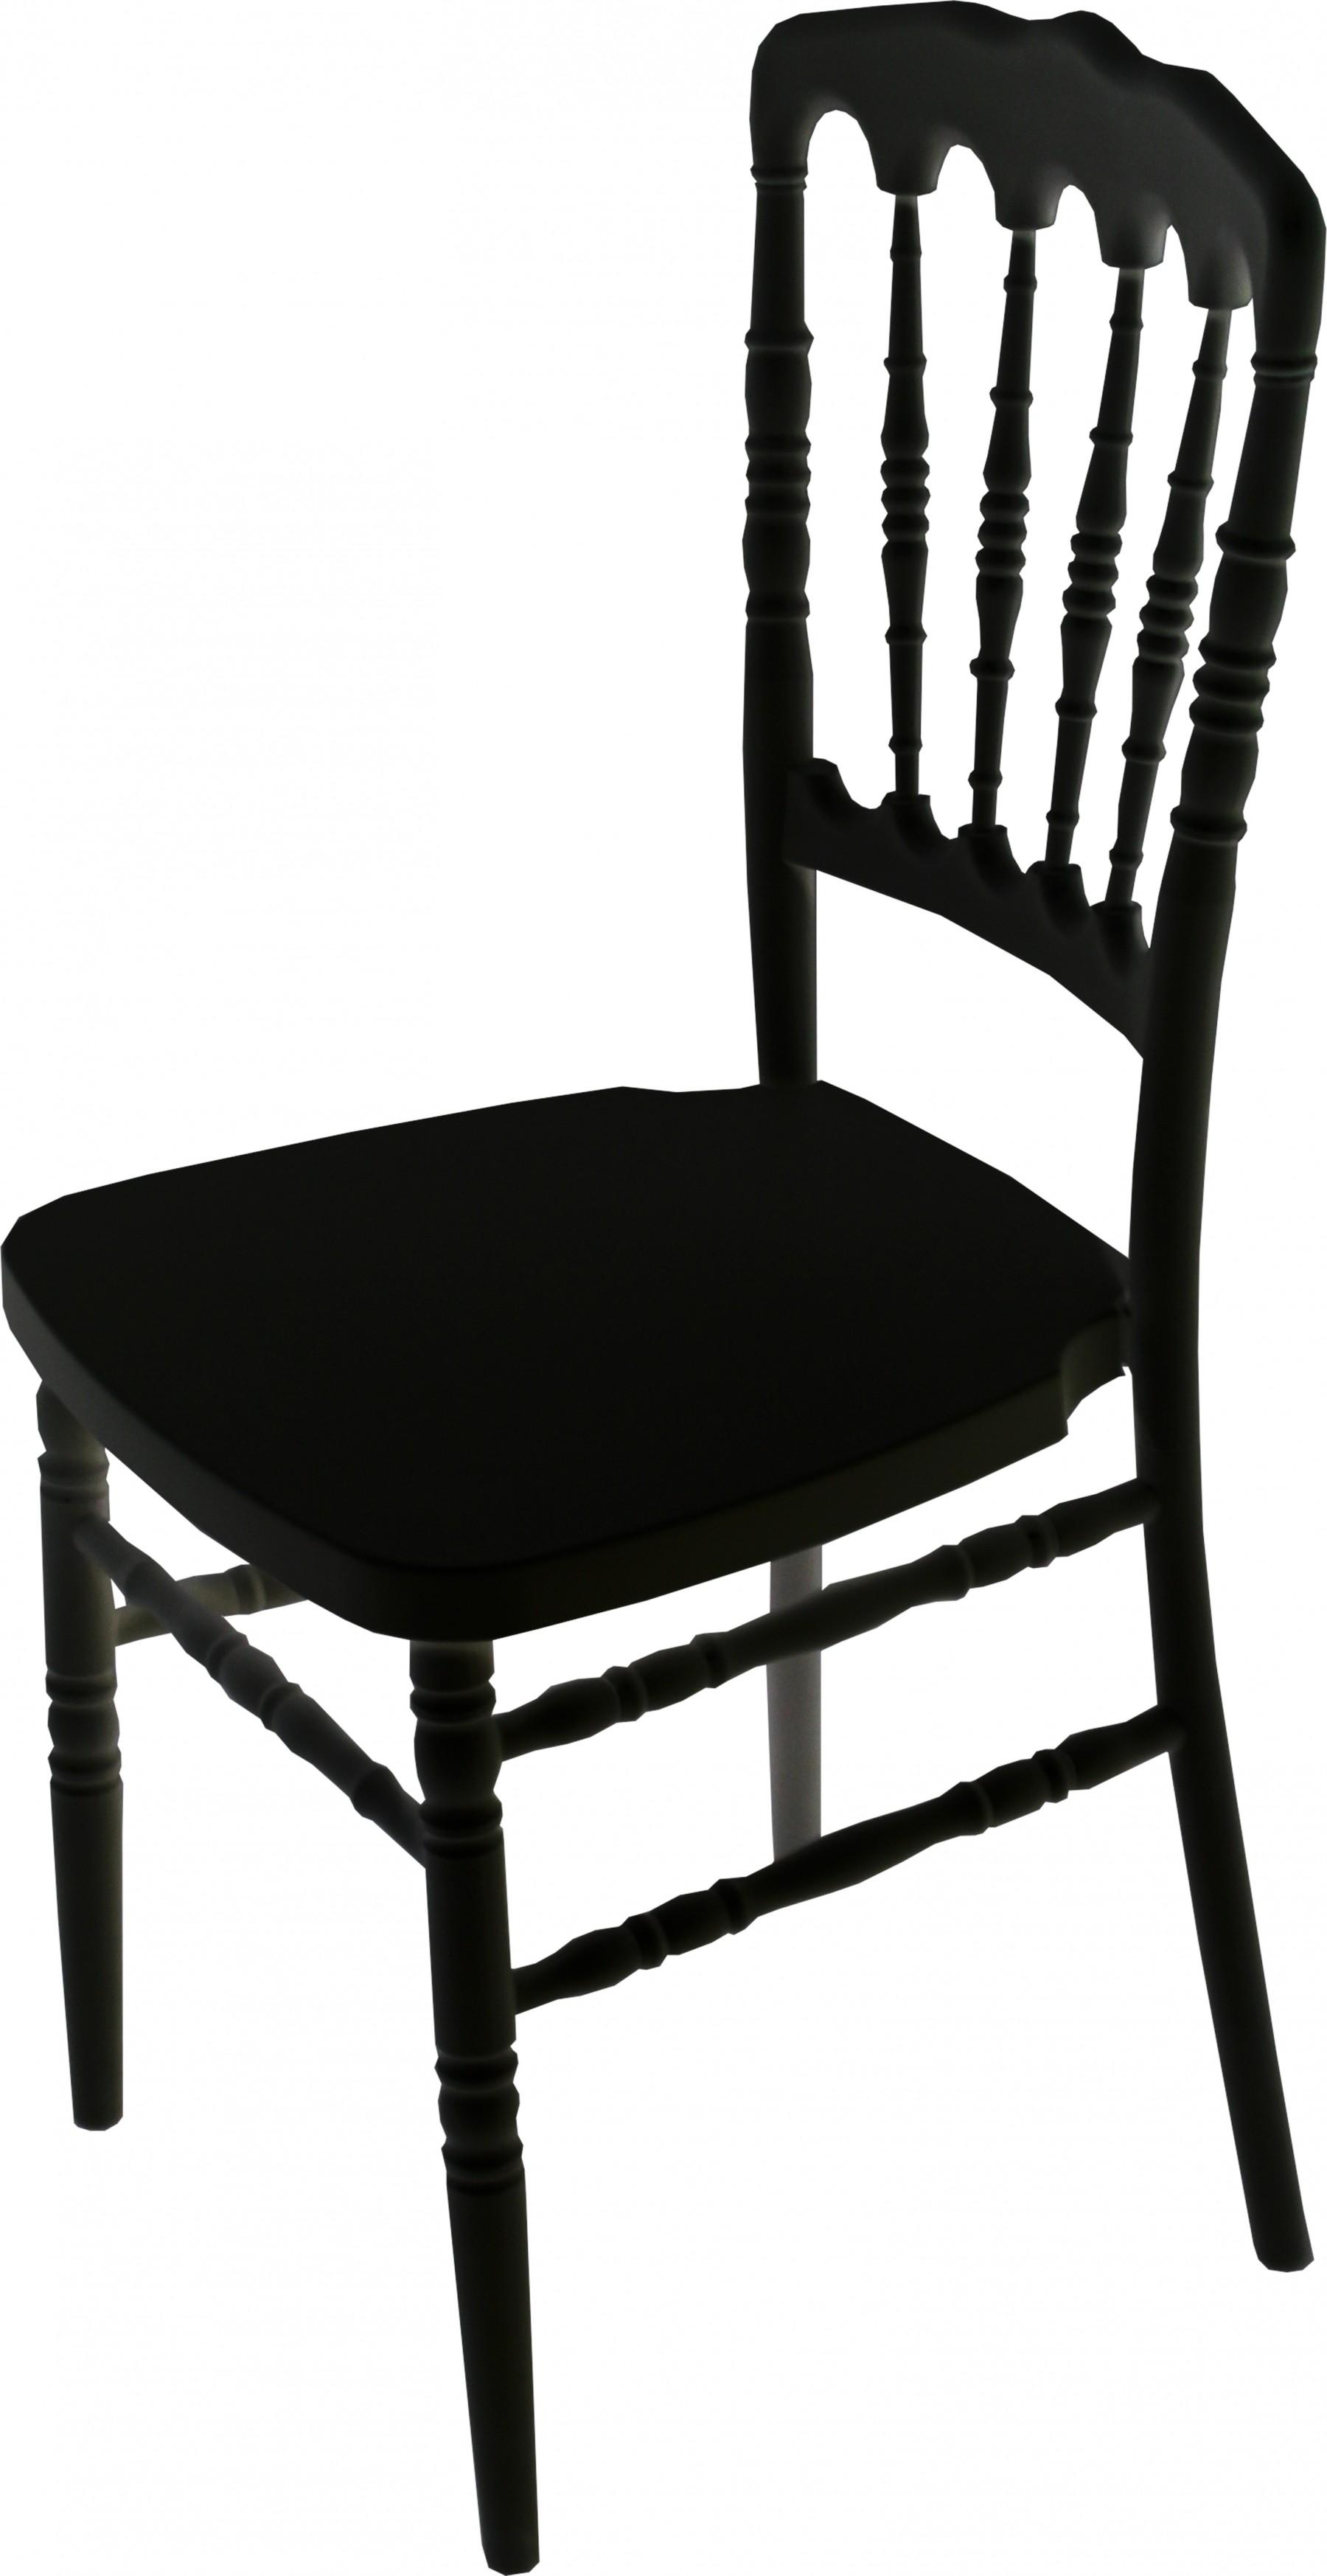 Fayette Black Napoleon Chair